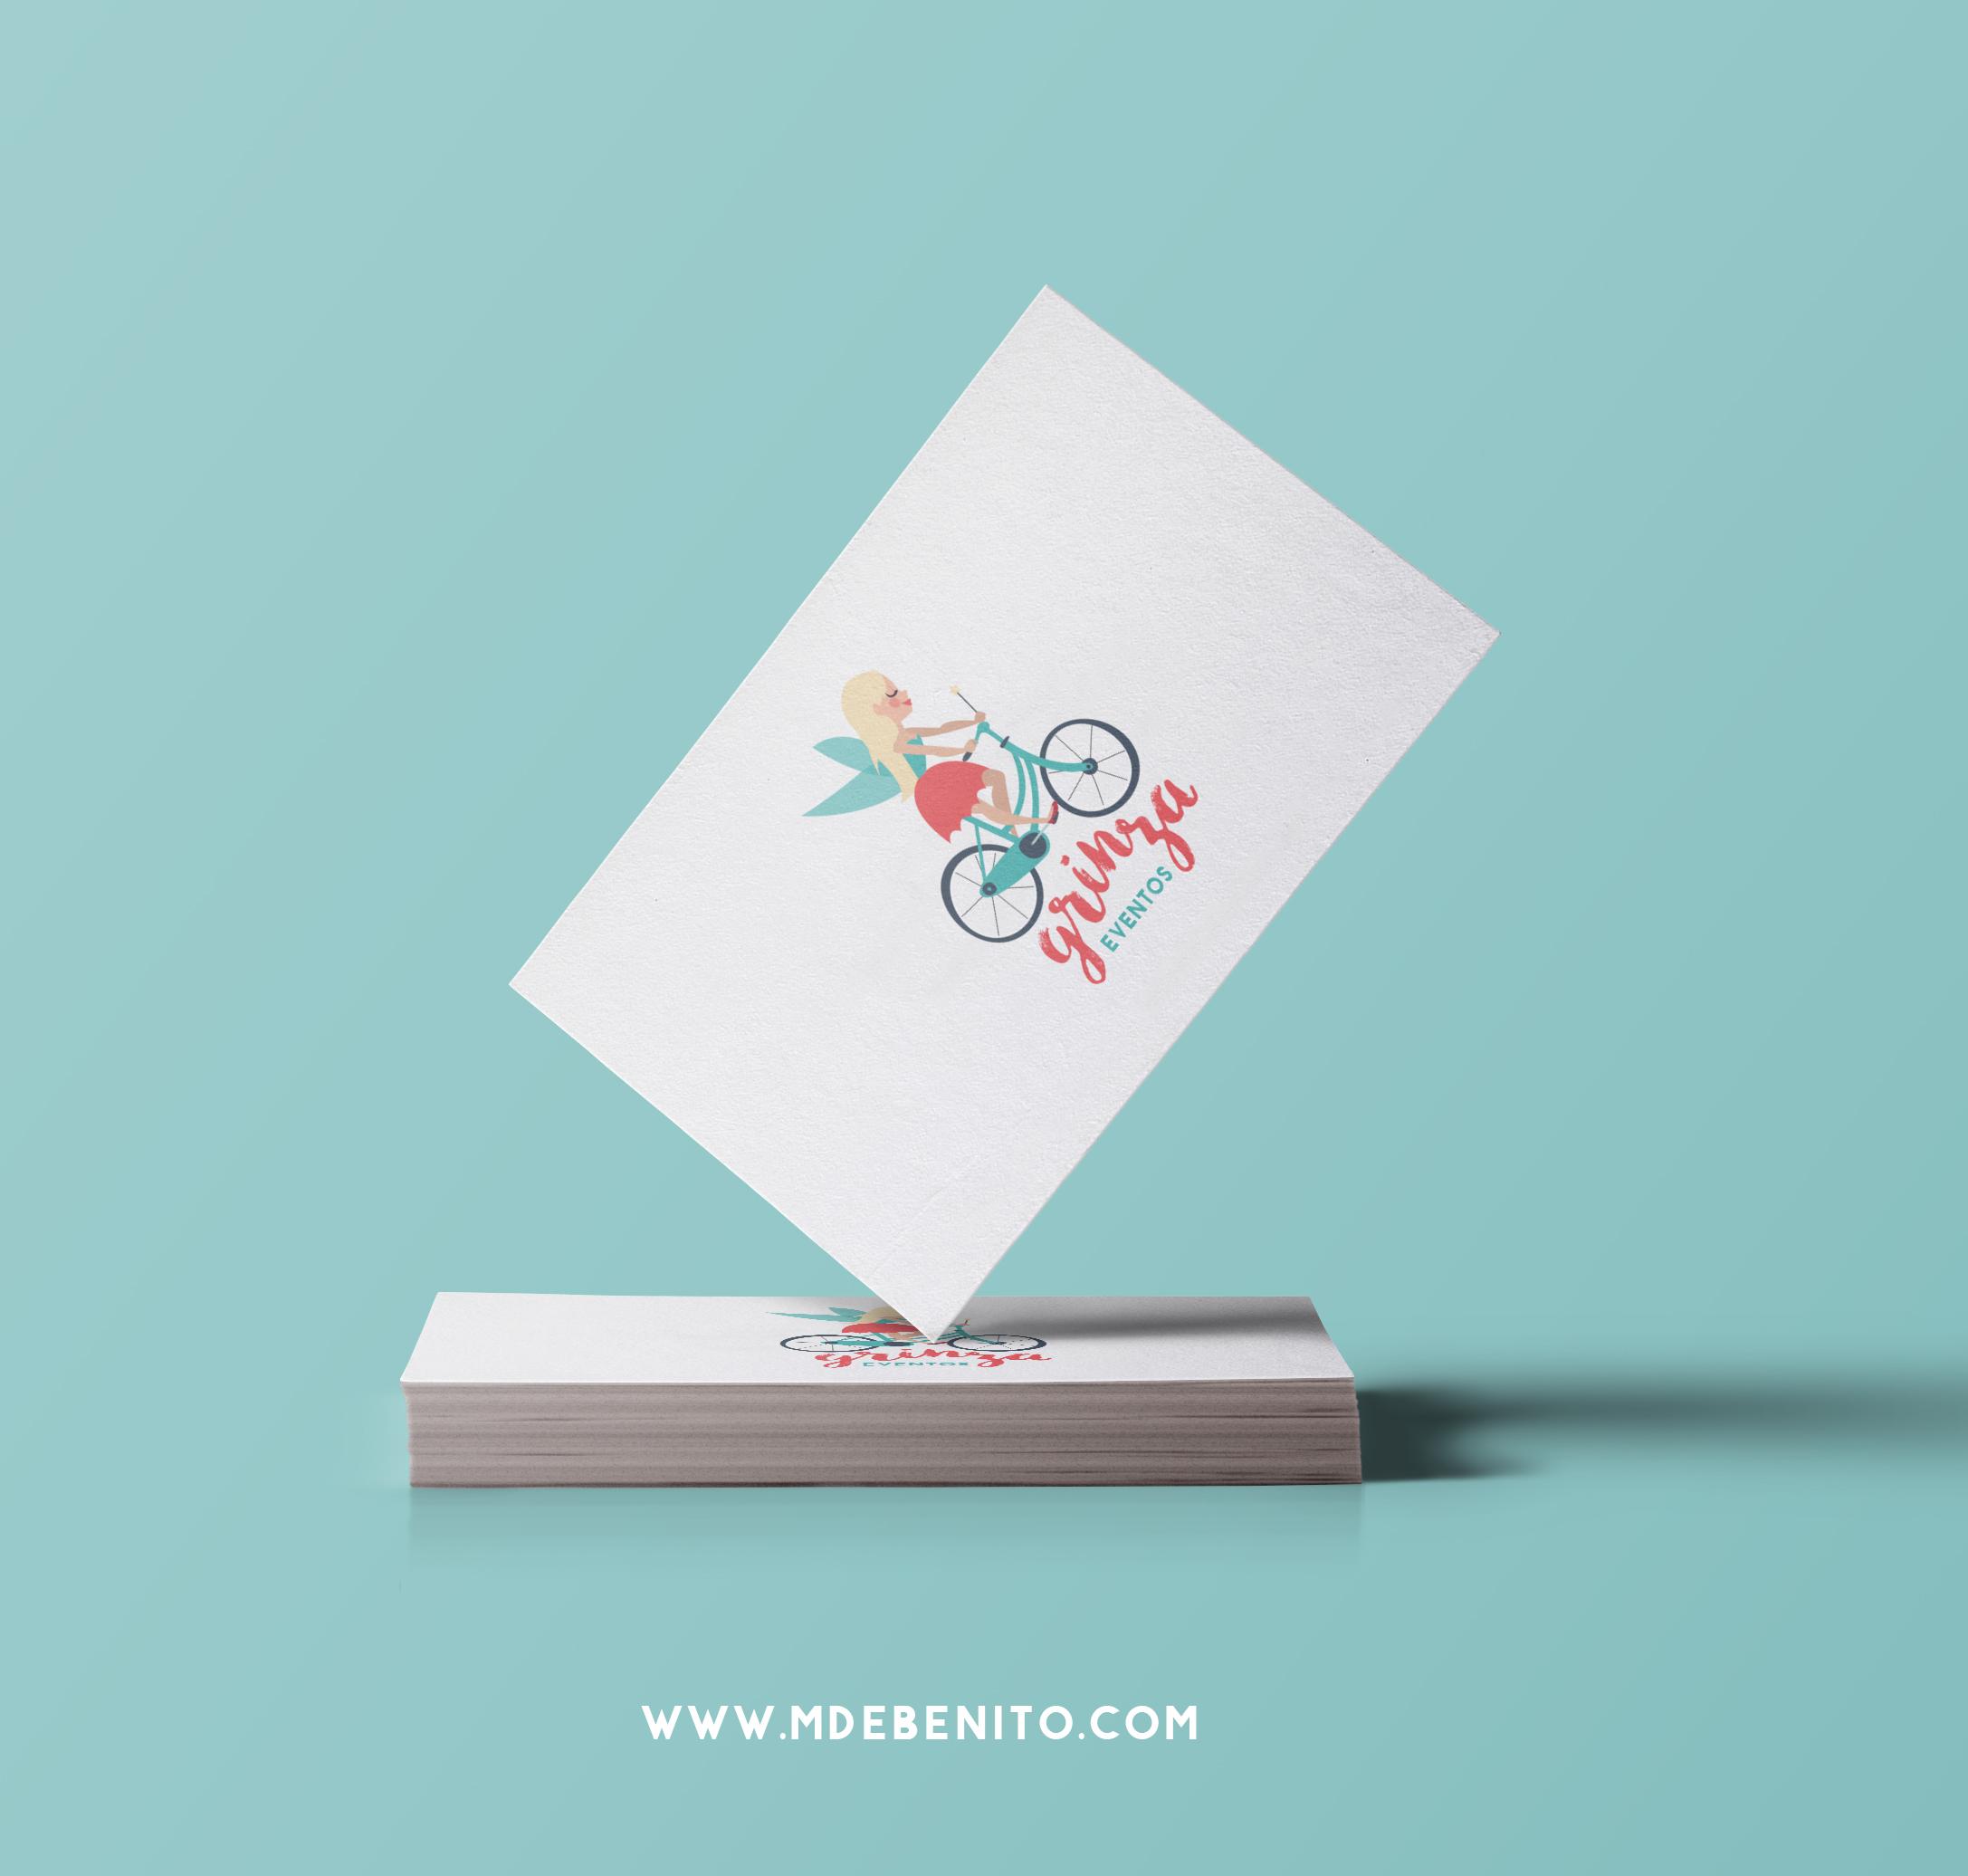 logo-evento-web-diseño-grafico-grinza-asturias-mdebenito.jpg